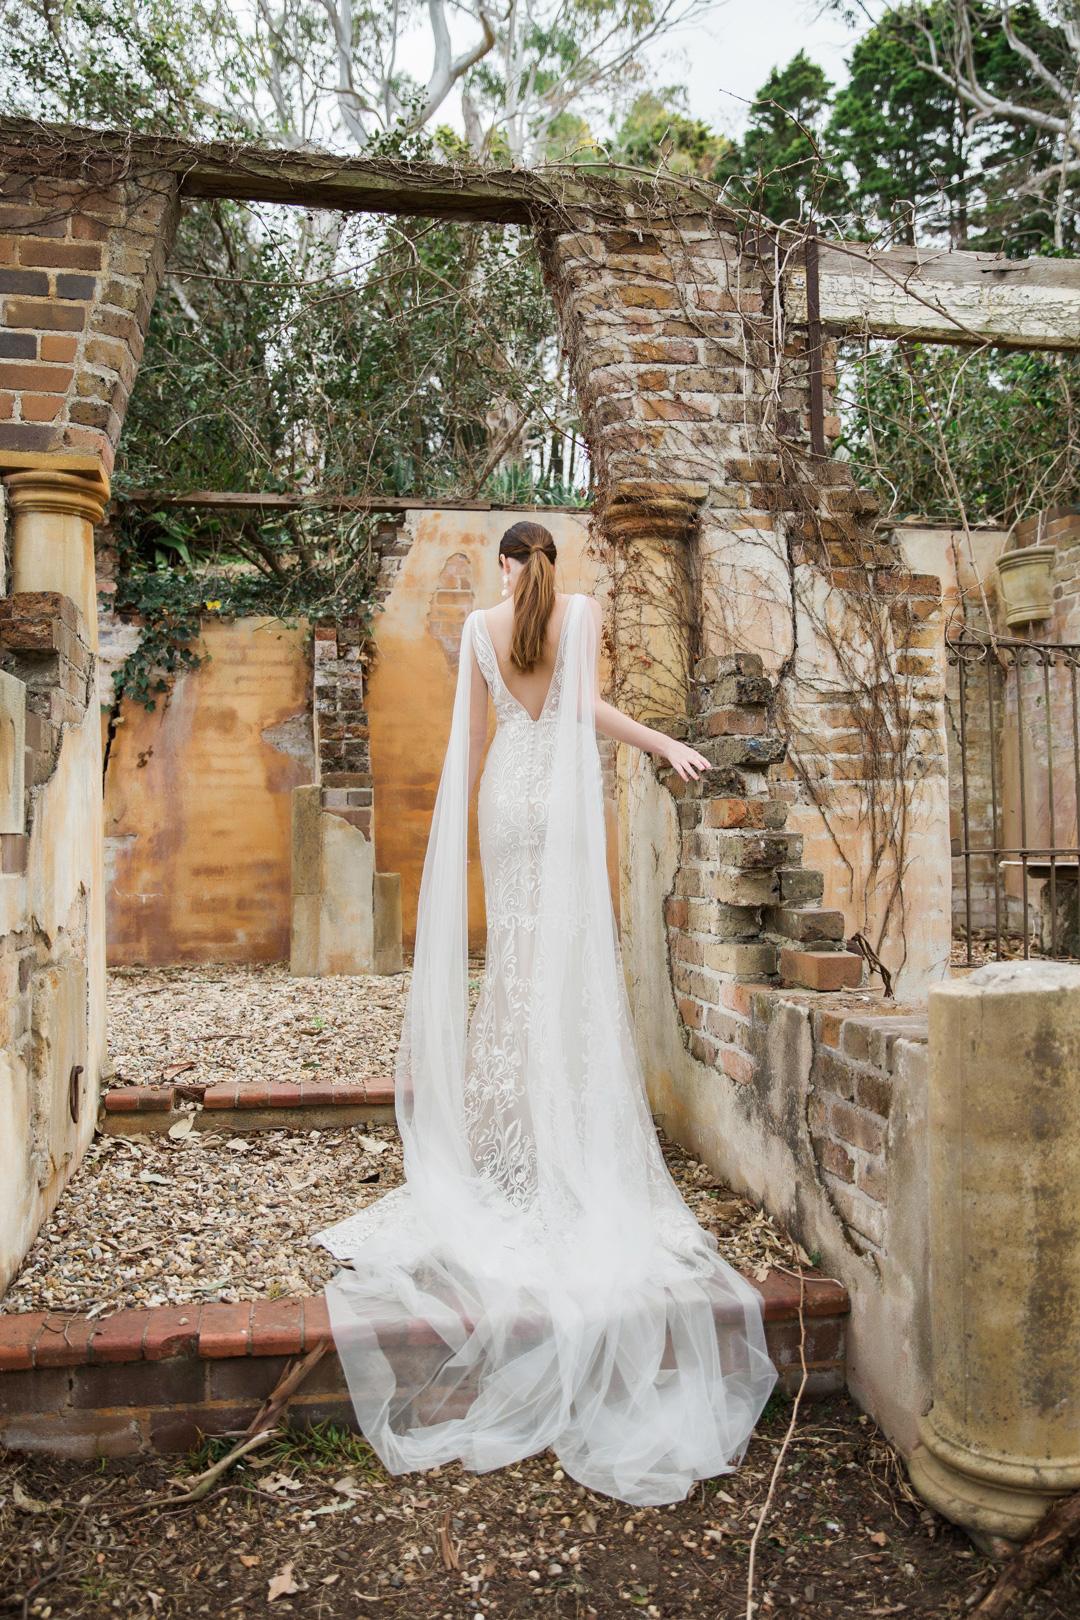 Hopewood-House-Natures-Embrace-Photoshoot-Amelia-Soegijono-Photography-4.jpg